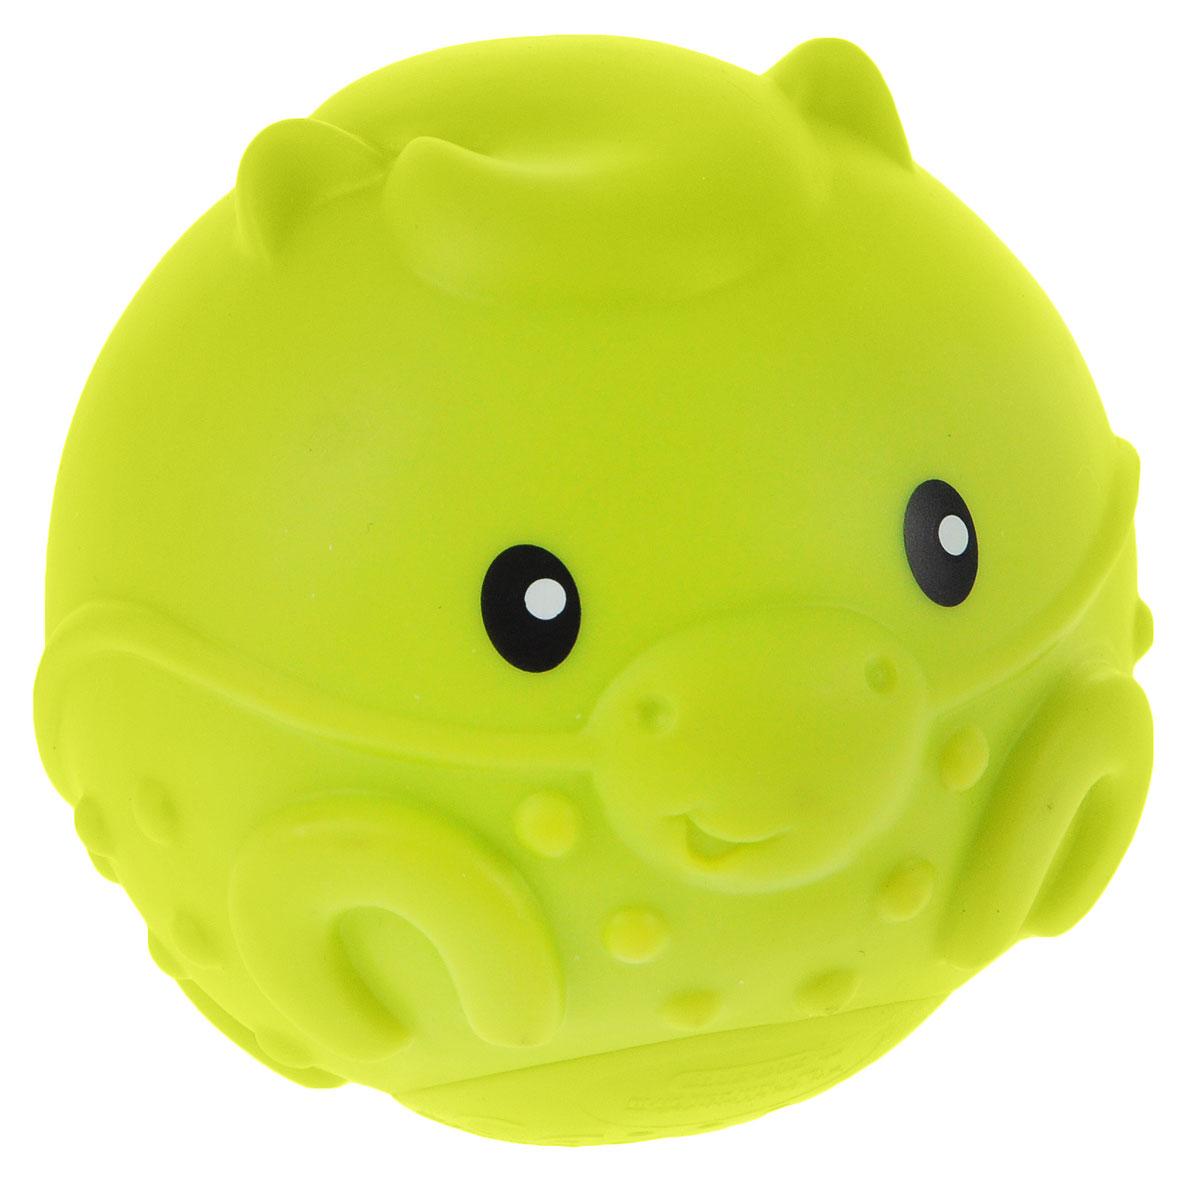 B kids Развивающая игрушка-пищалка Лошадка b kids развивающая игрушка шар конструктор